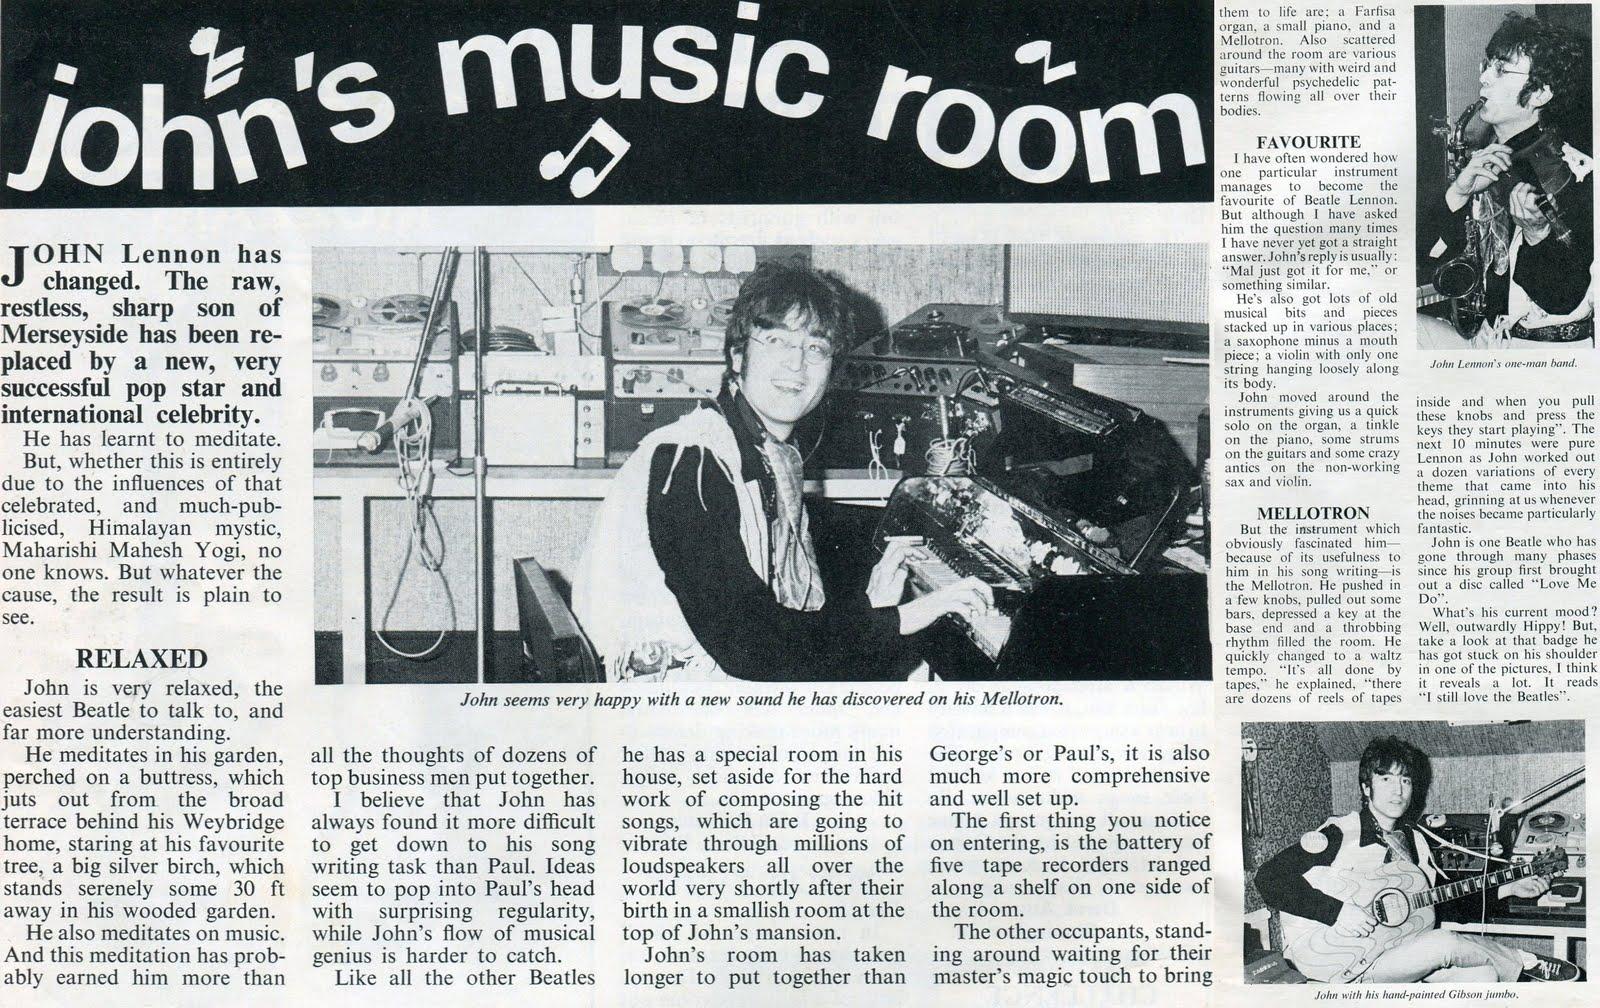 John Lennon Home Studio Article